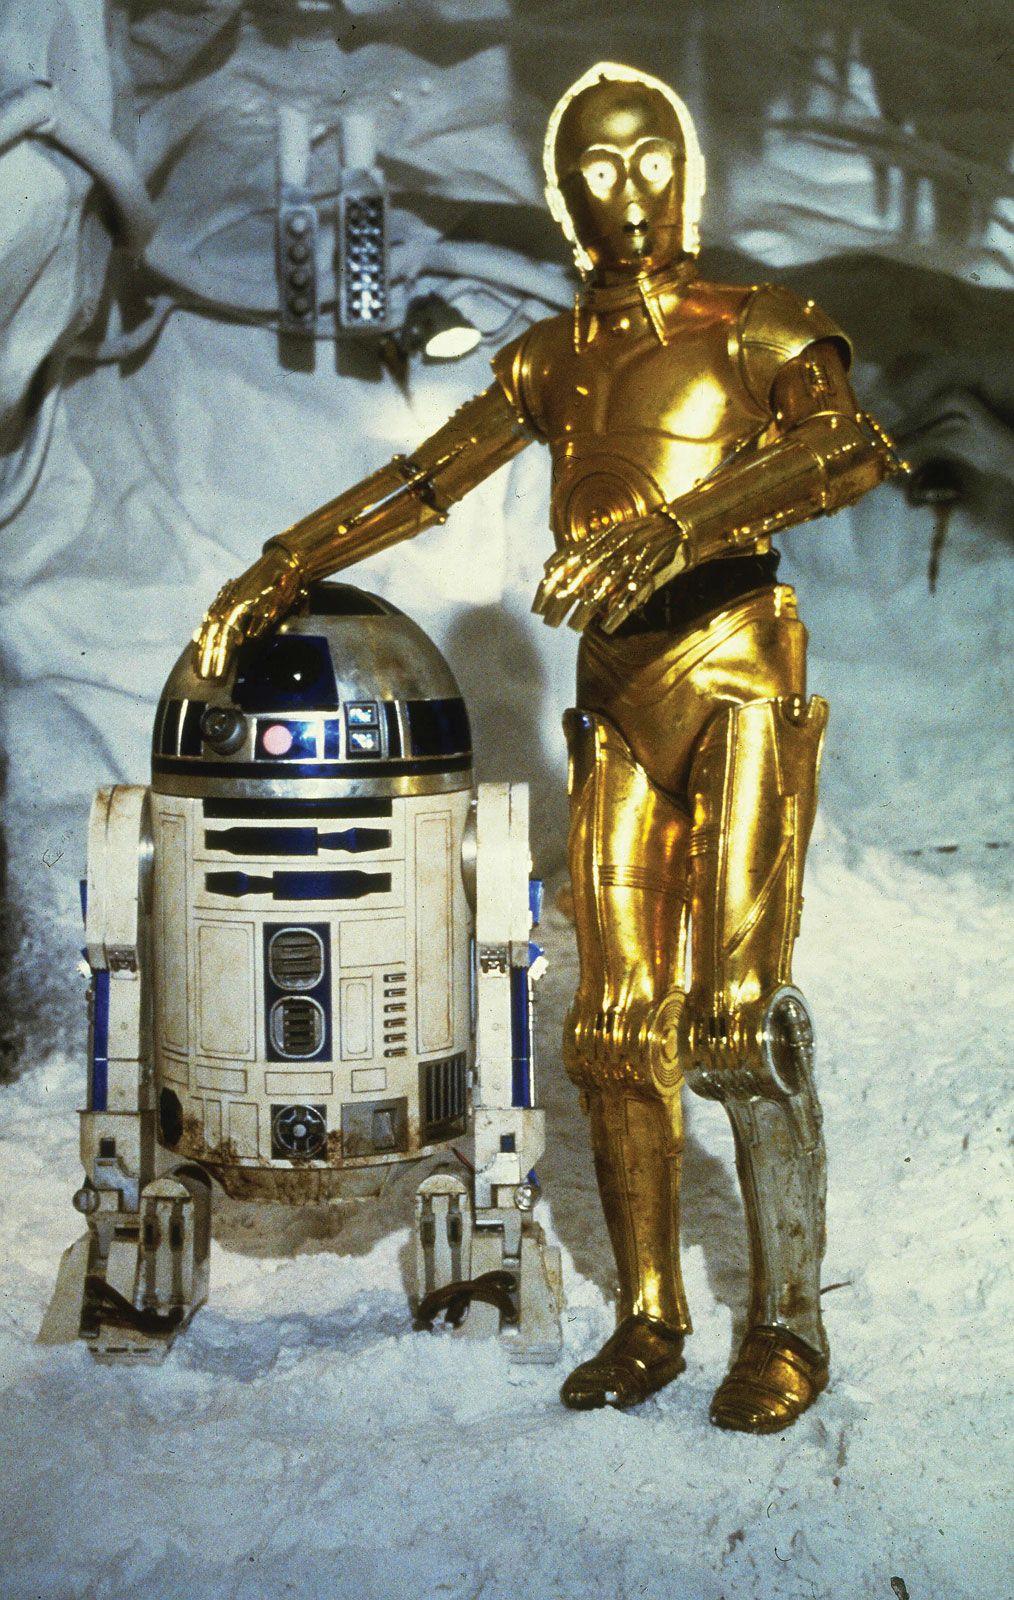 R2d2 And C3po In Movie r2d2 and c3po | R2D2 a...